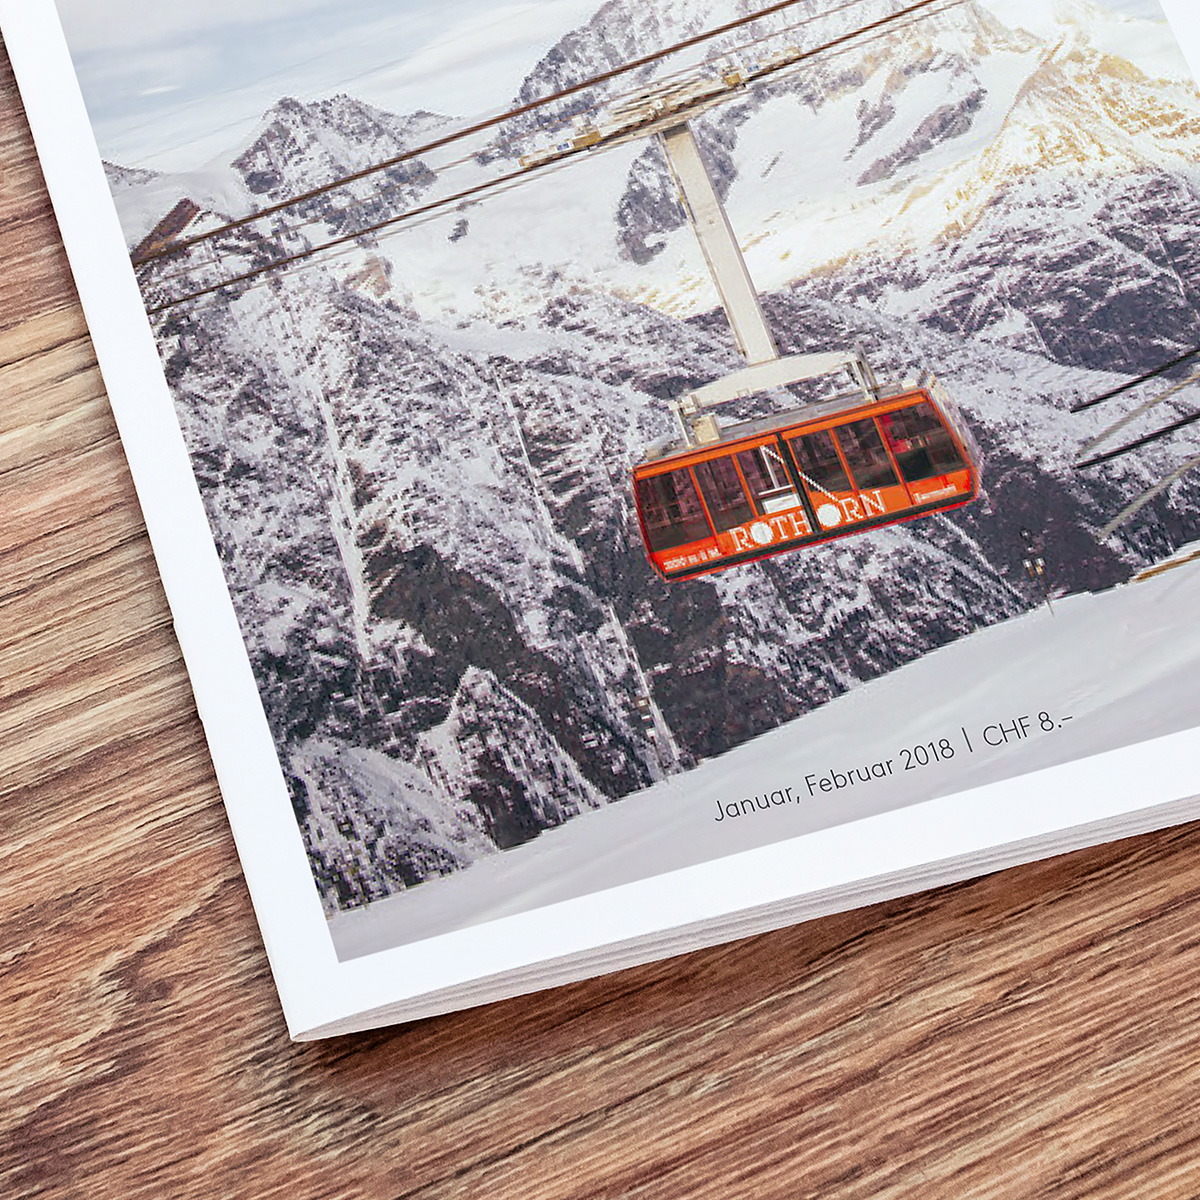 Thumbnail: LandLiebe – Editorial Design